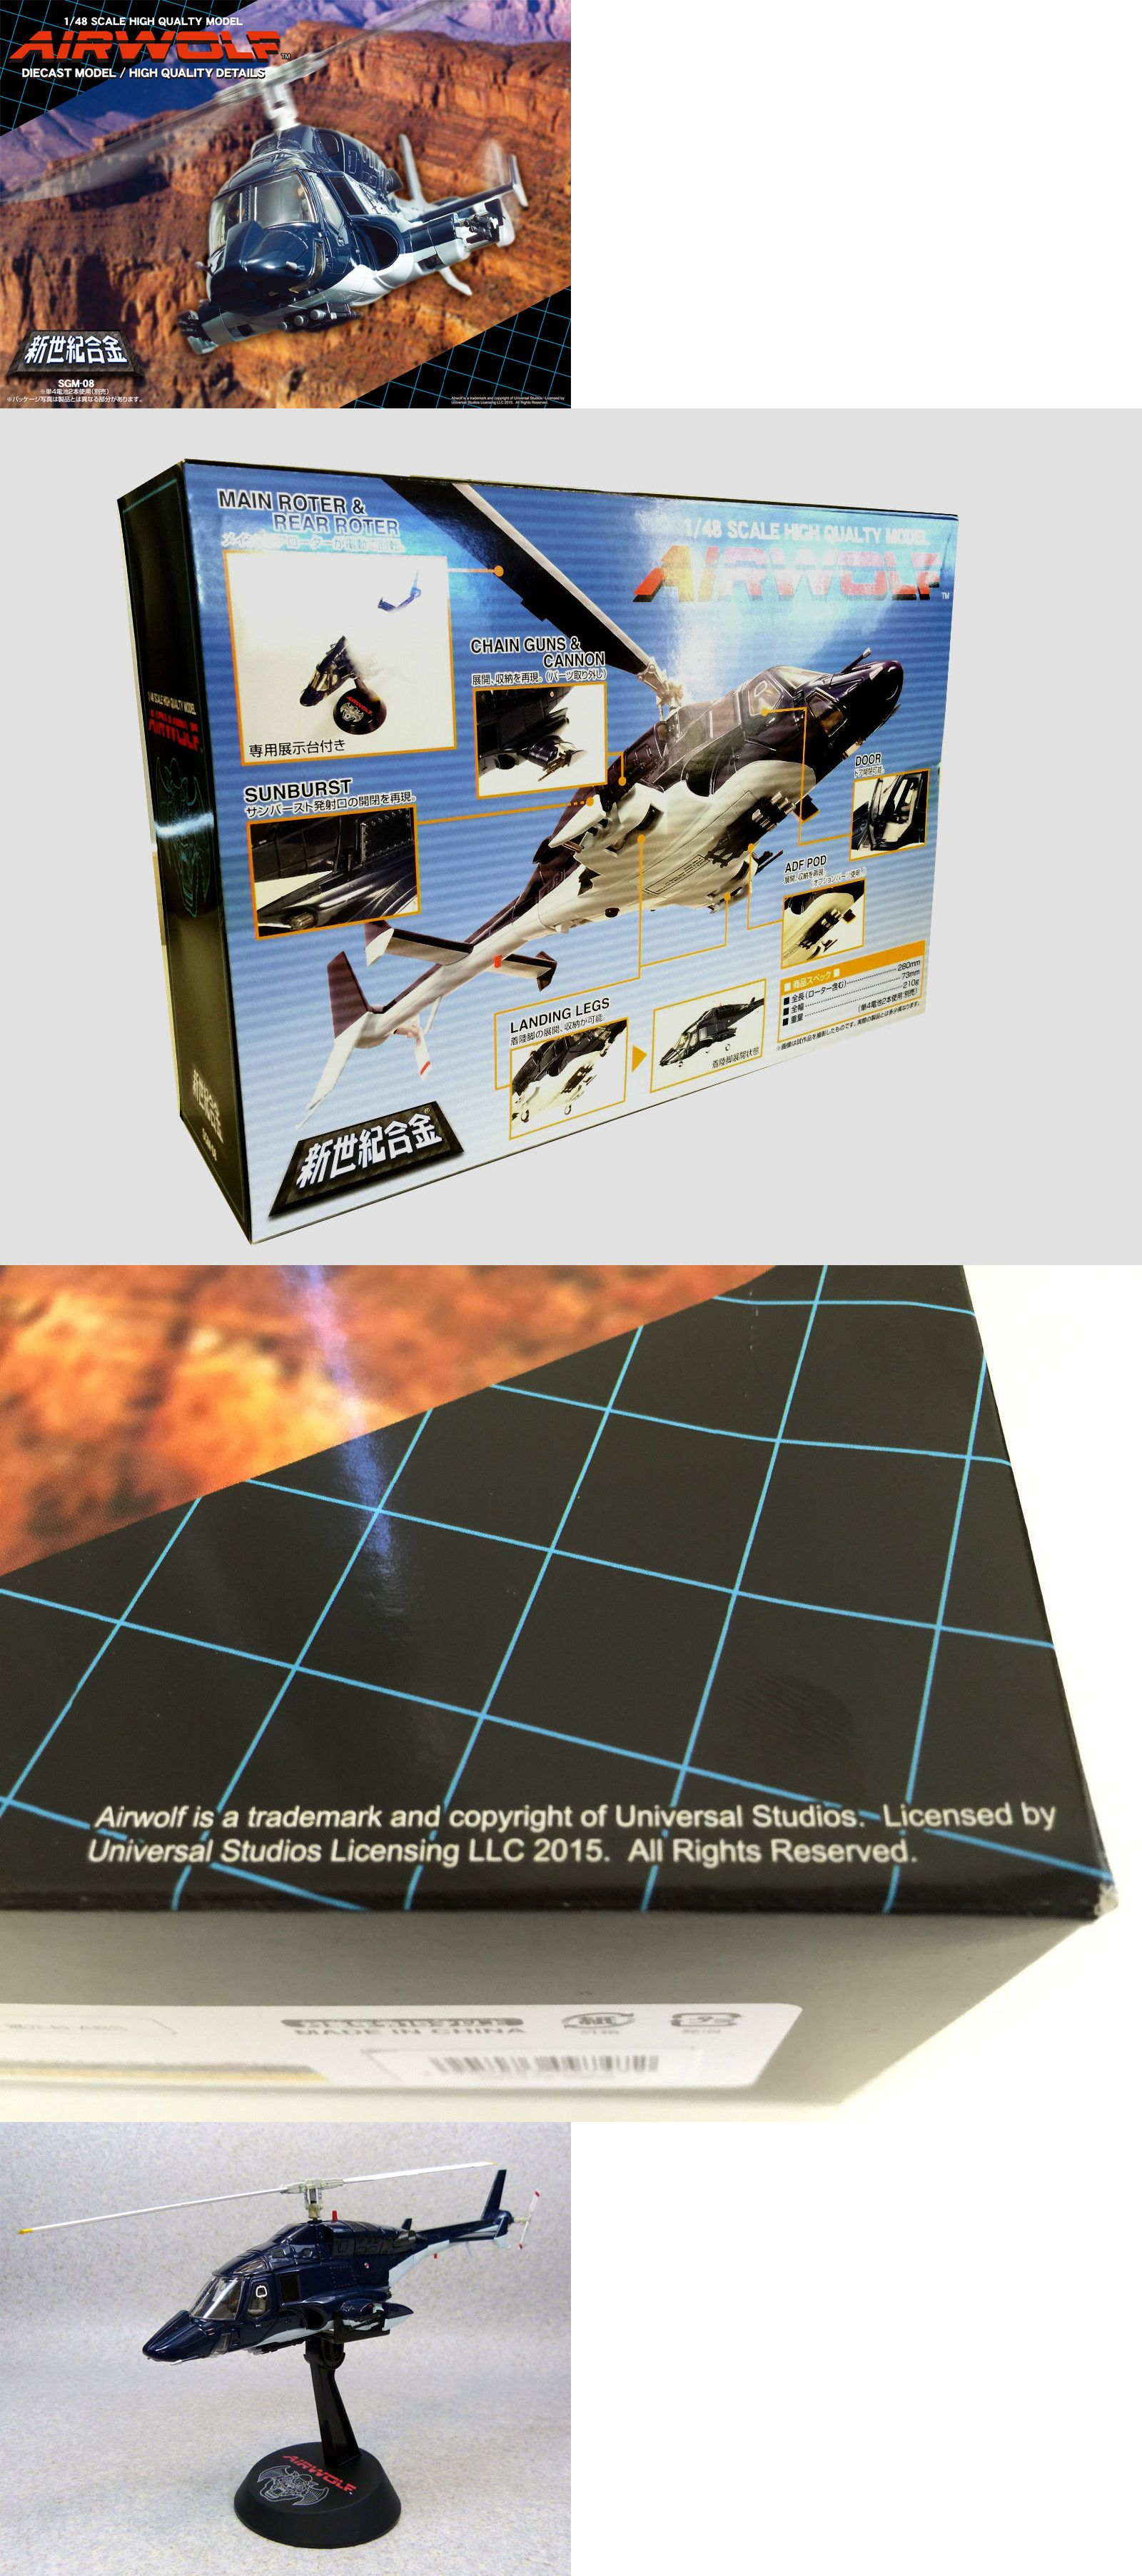 Aircraft and Spacecraft 180268: Sgm-08-Bl: Aoshima Airwolf 1